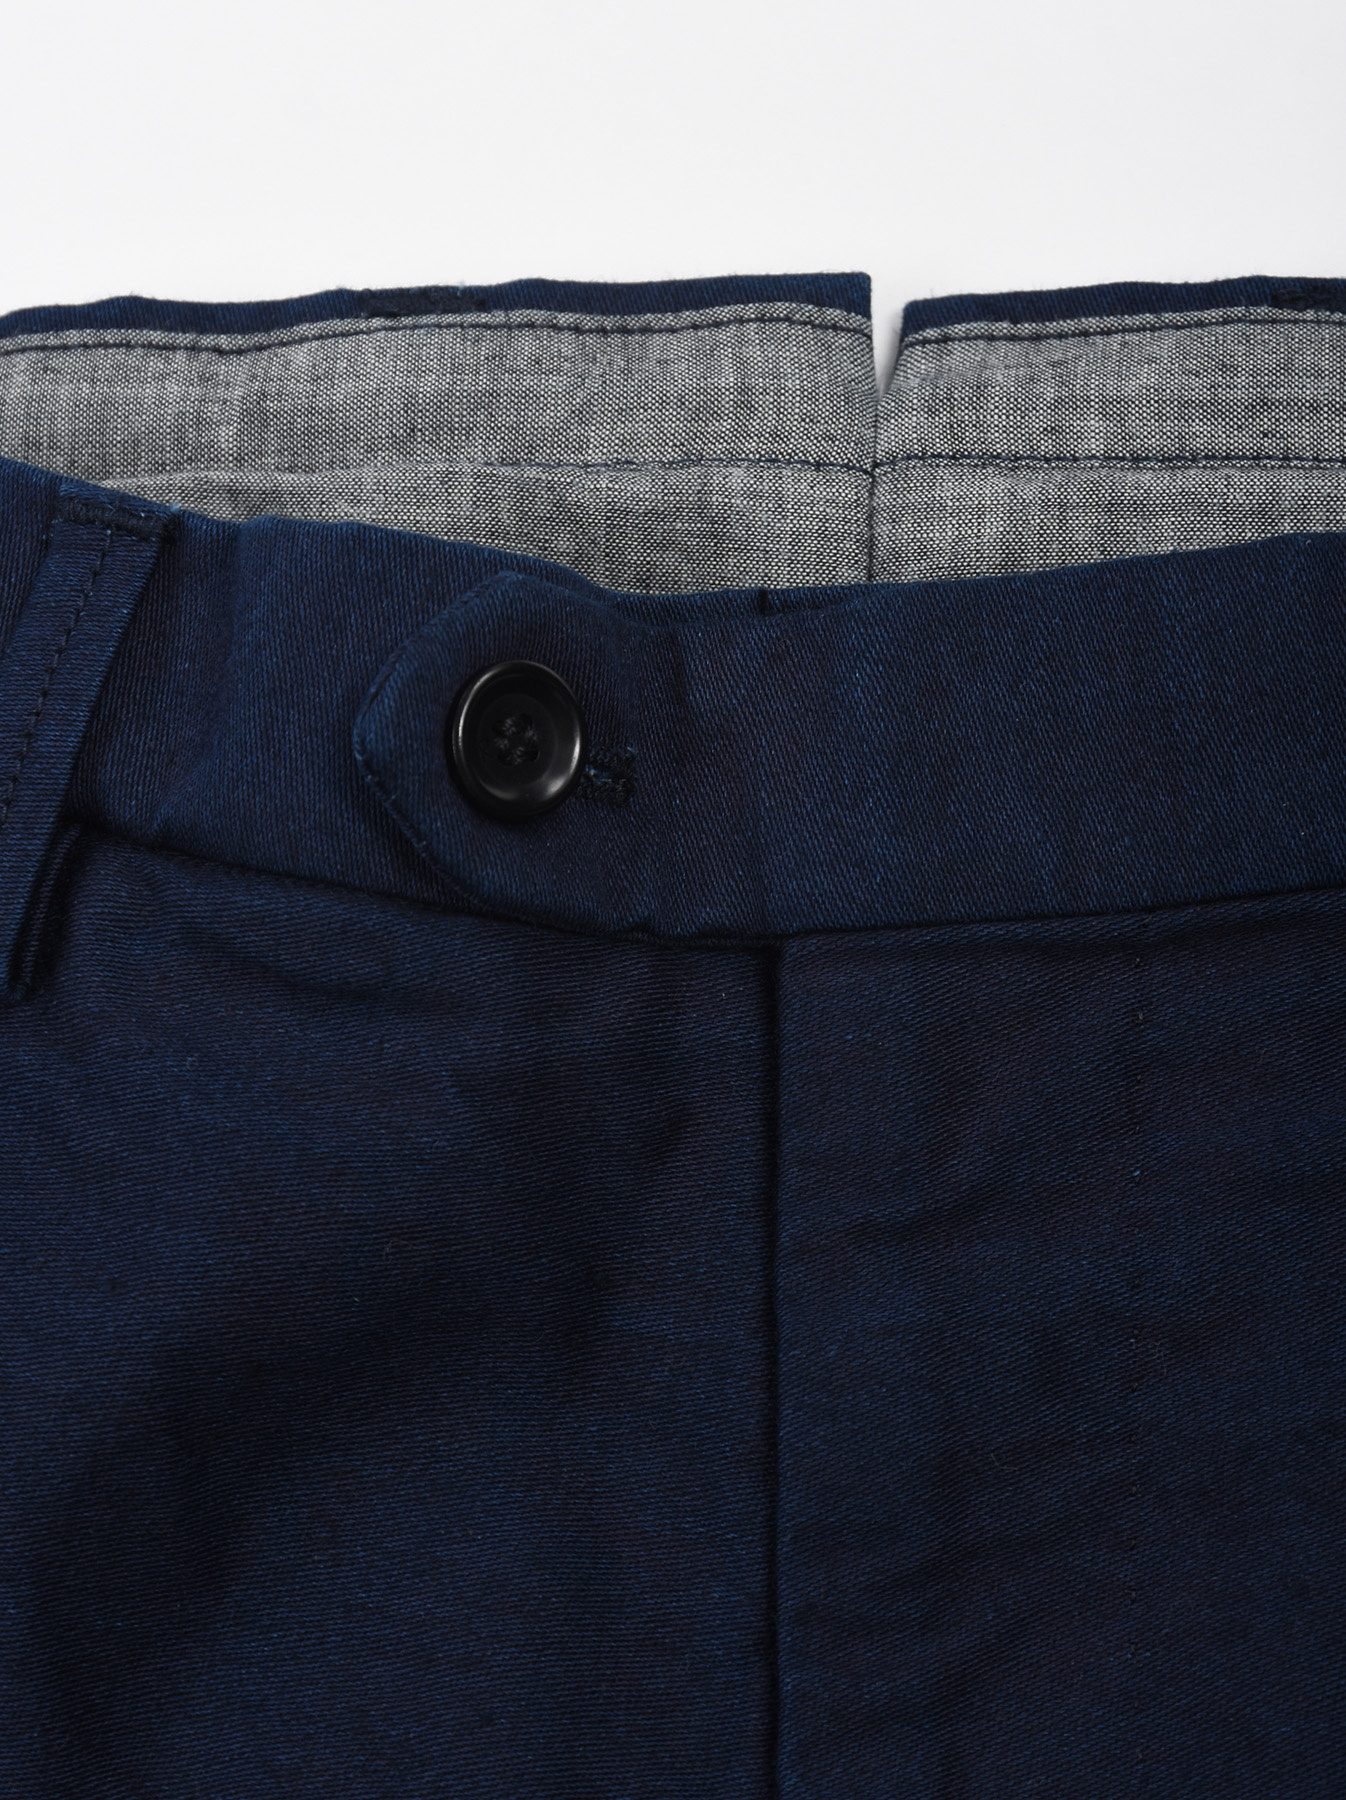 WH Indigo Mugi Yoko-shusi Soroe Pants-6